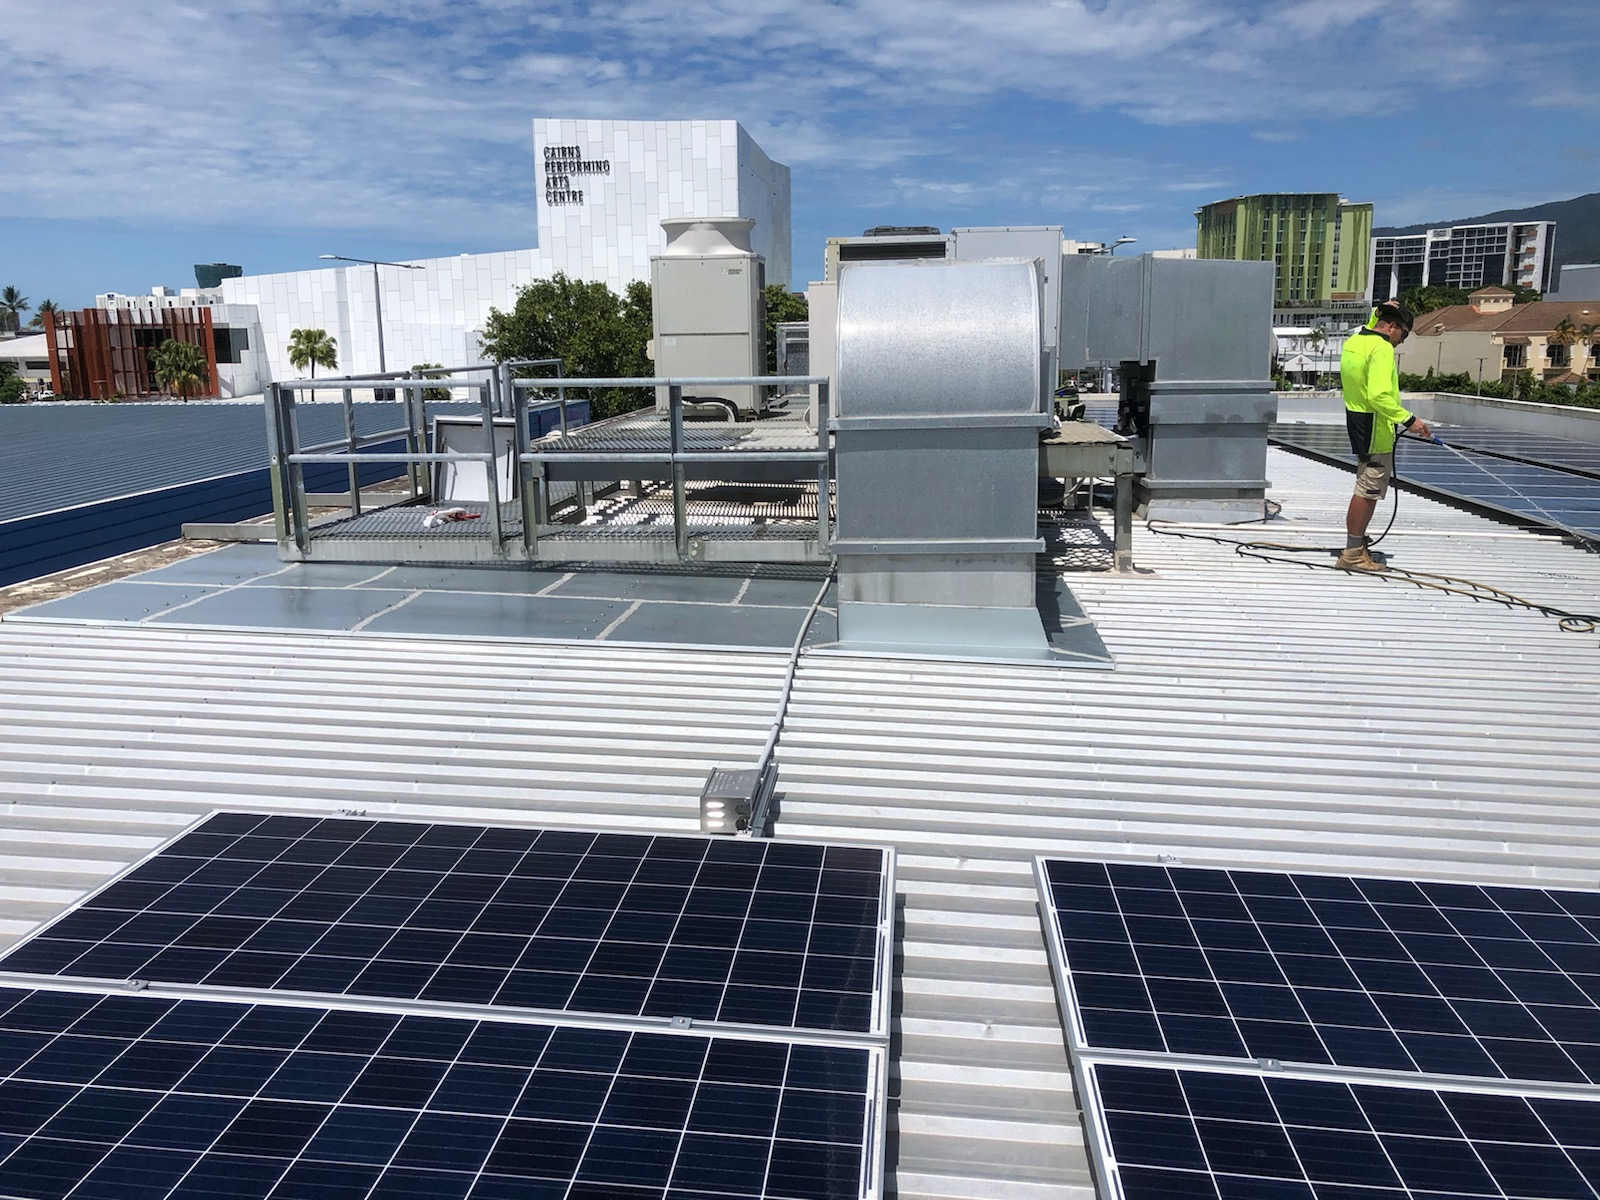 Rooftop aircon platform